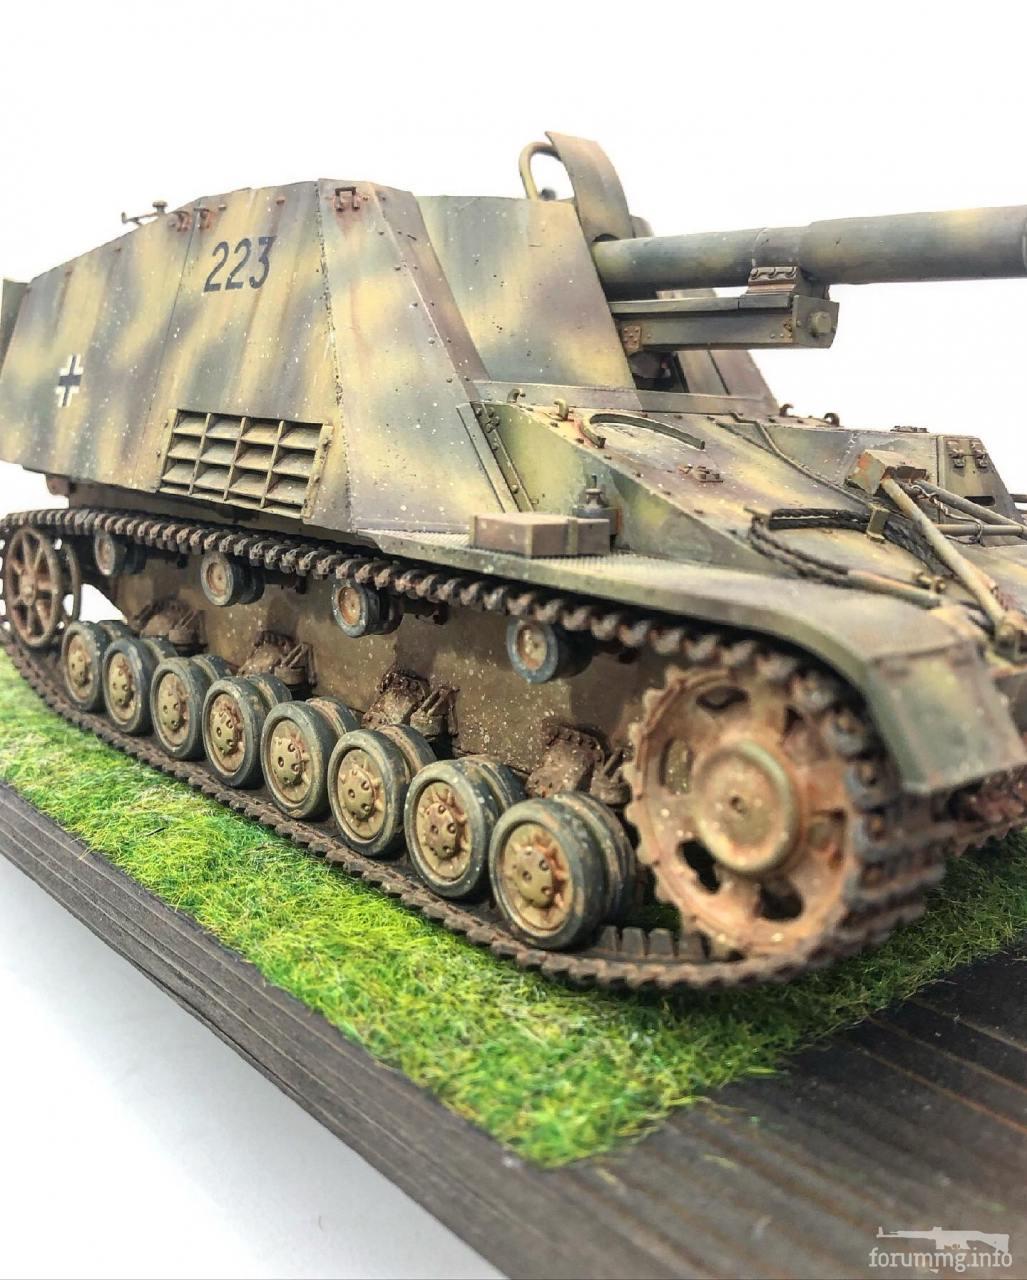 131584 - Модели бронетехники